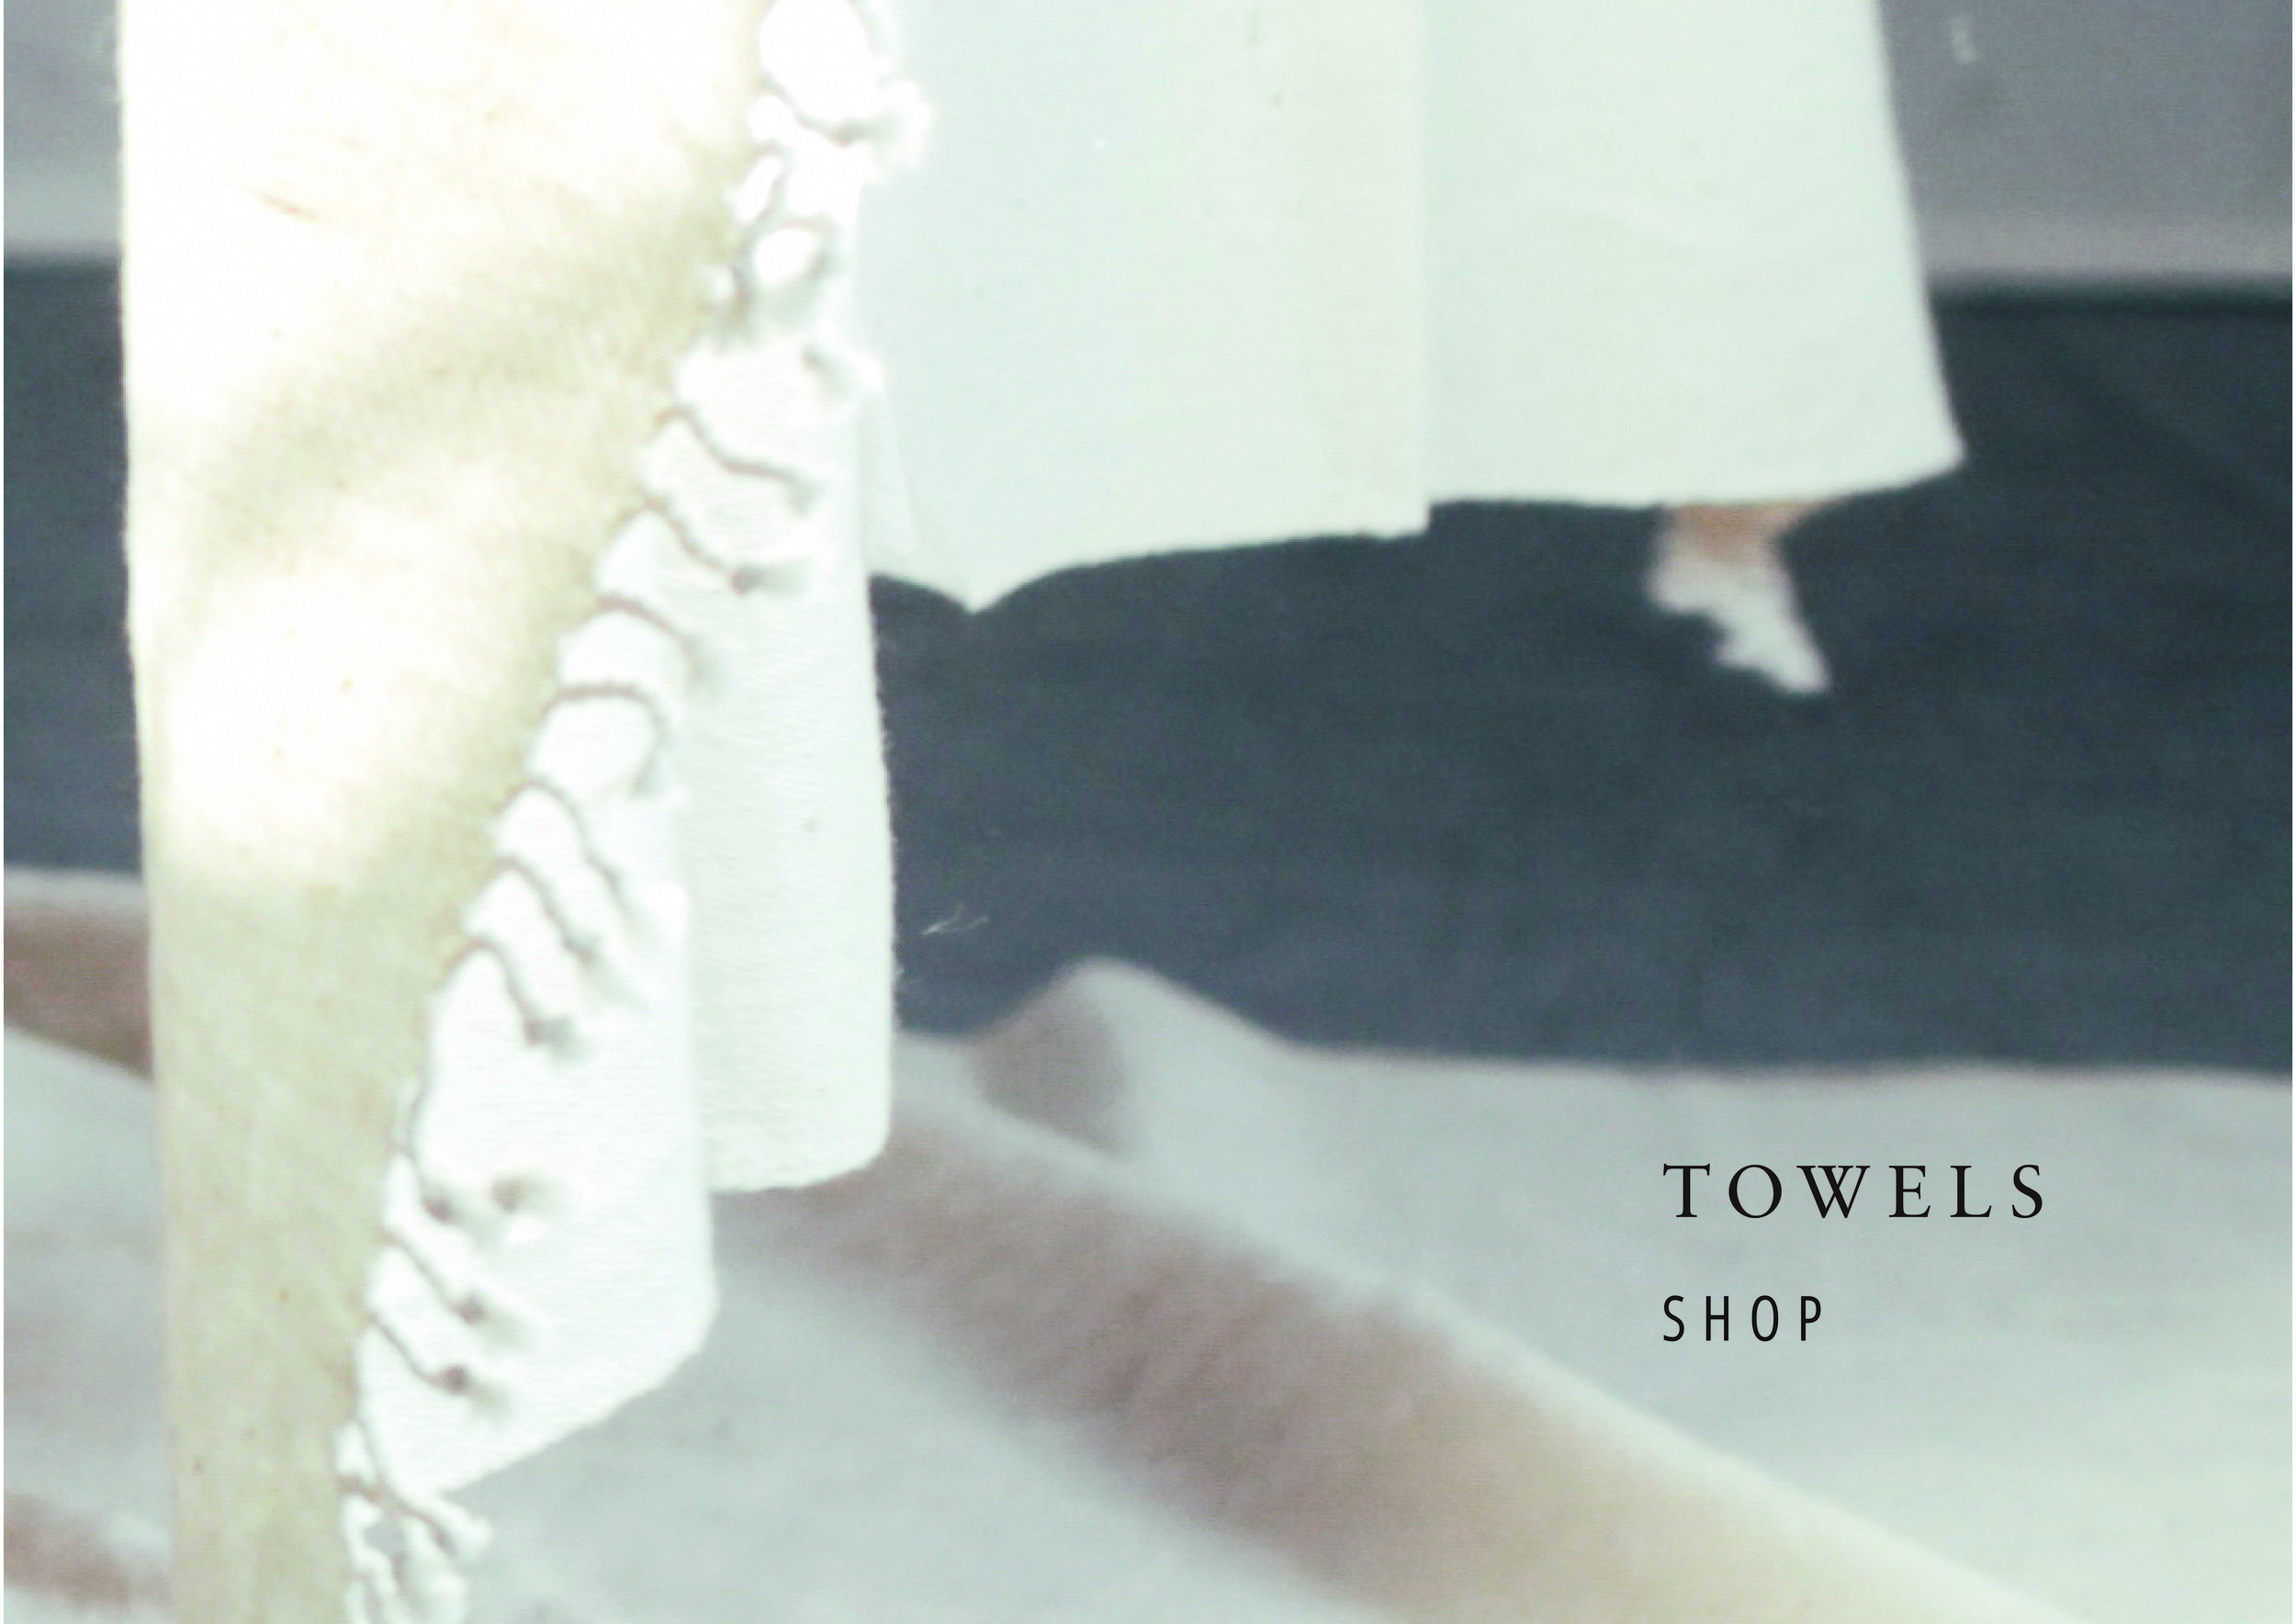 towels shop w.jpg